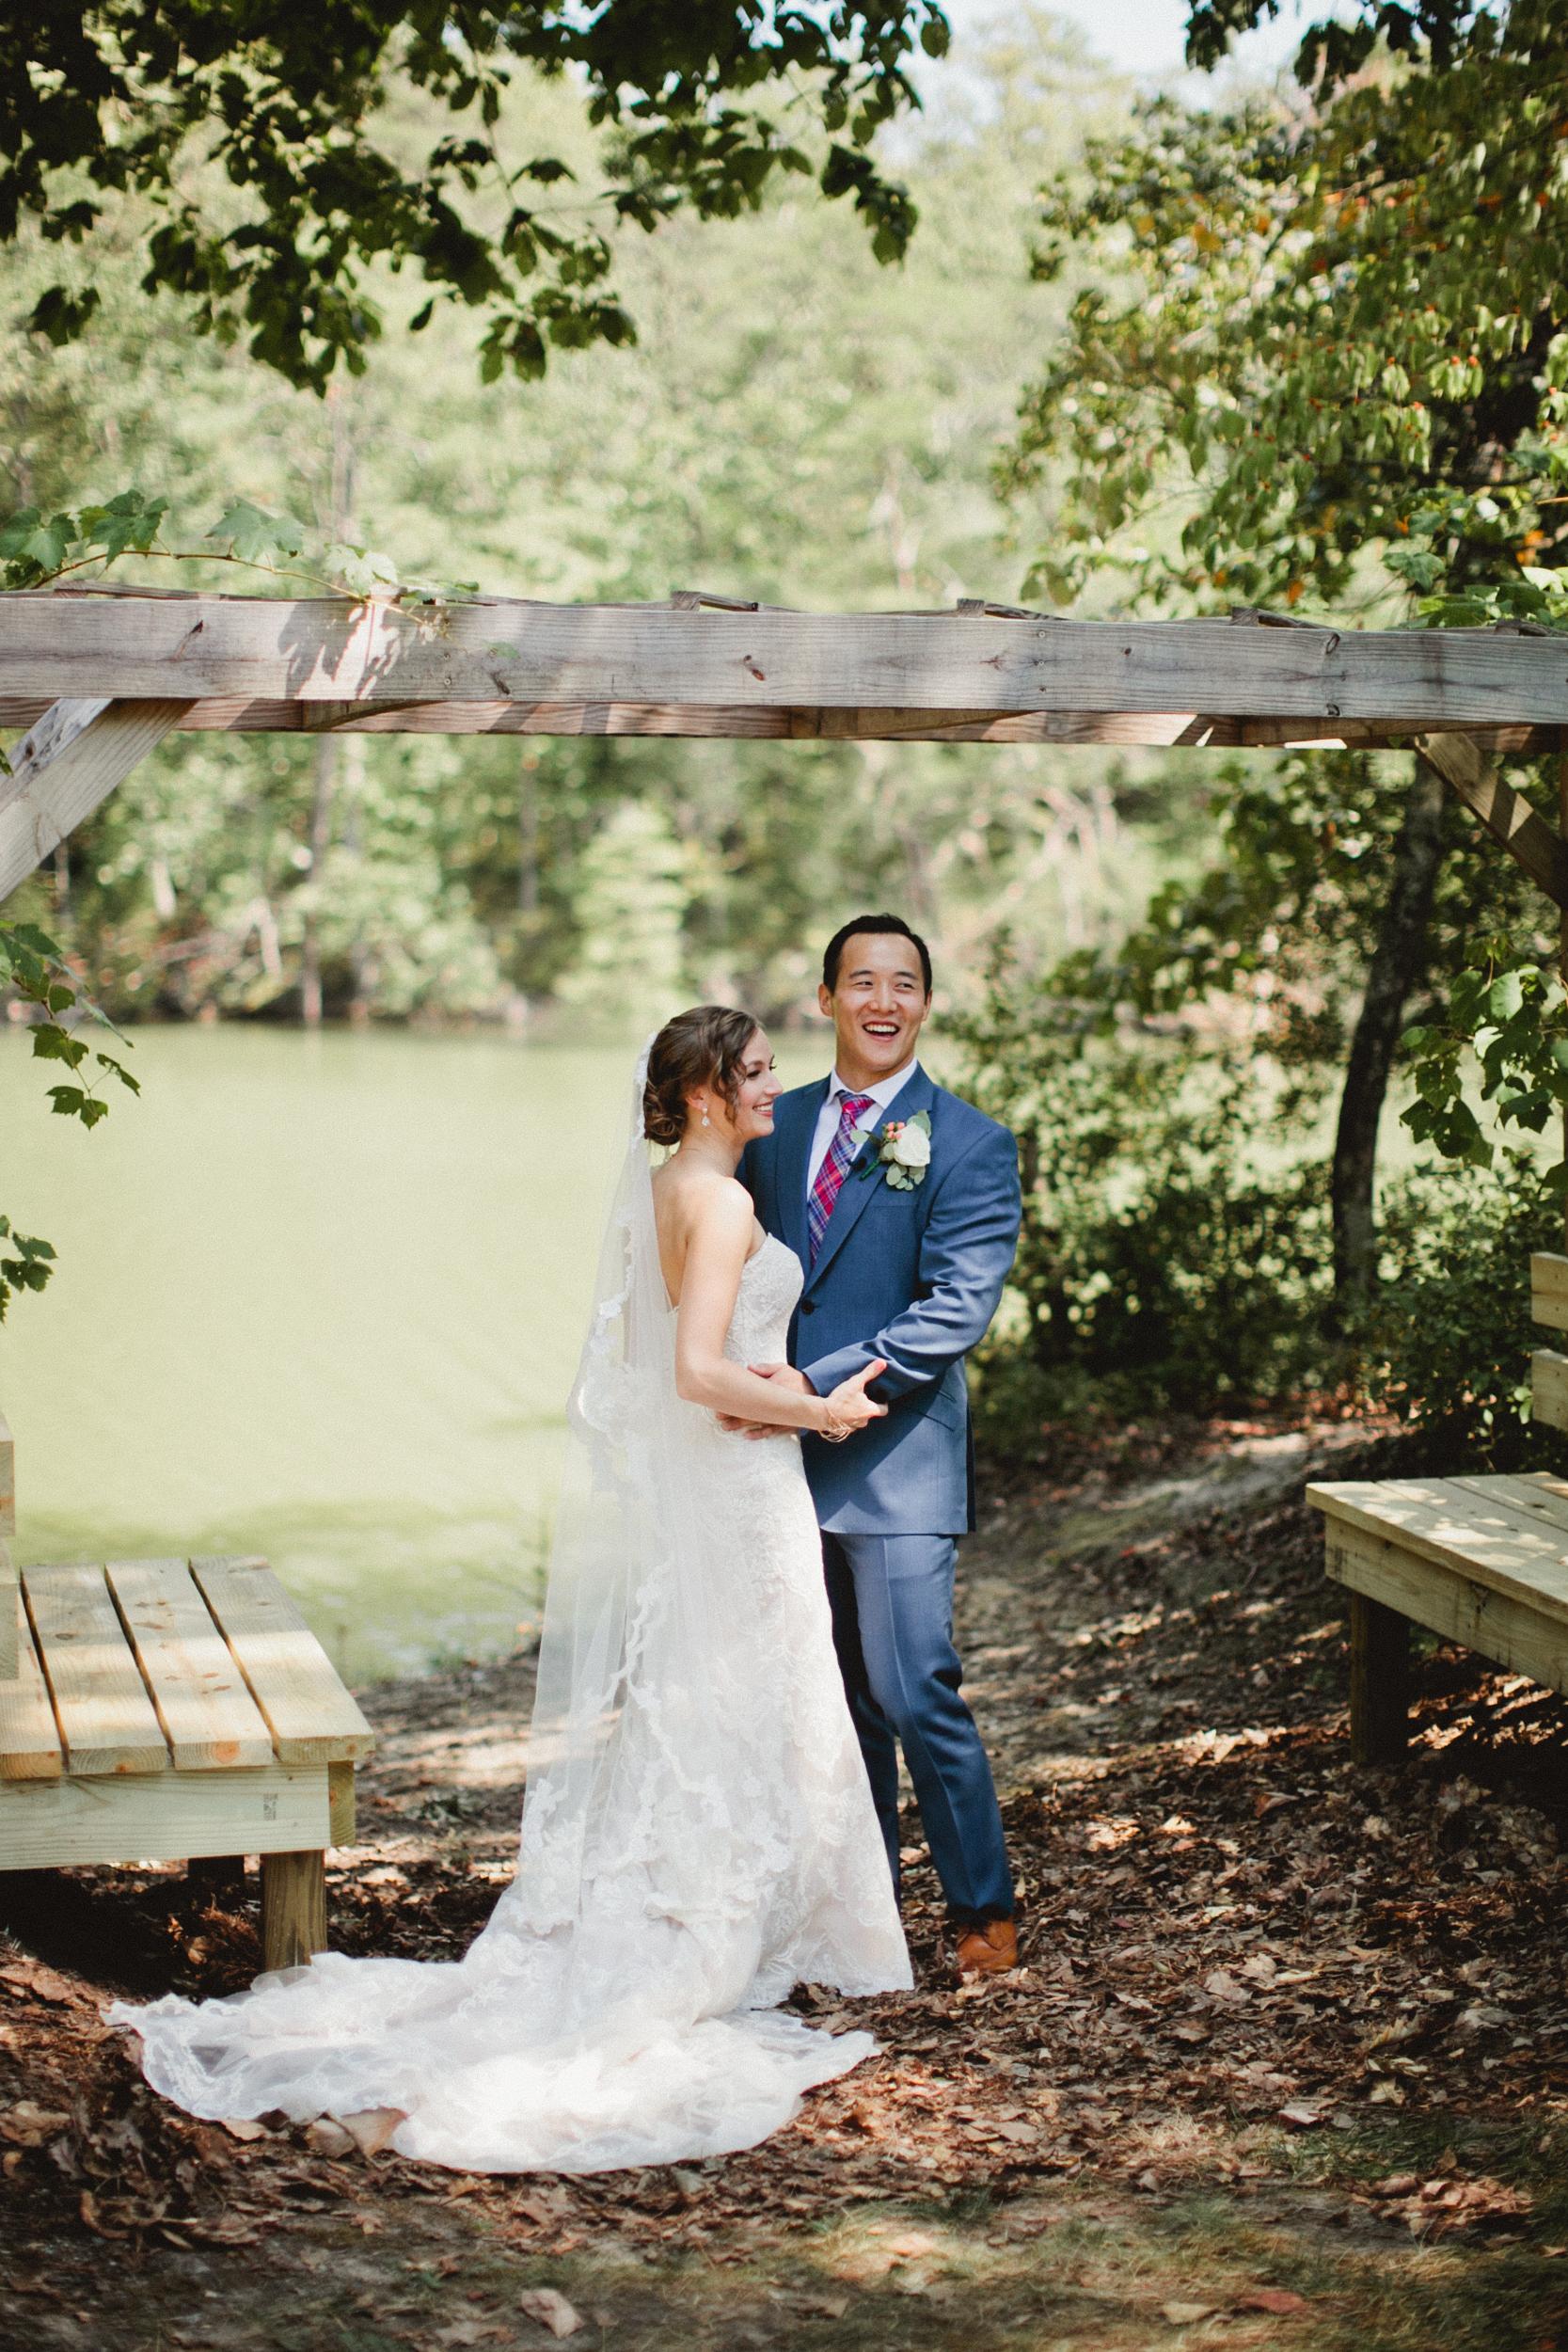 Maine-Wedding-Photographer-961.jpg